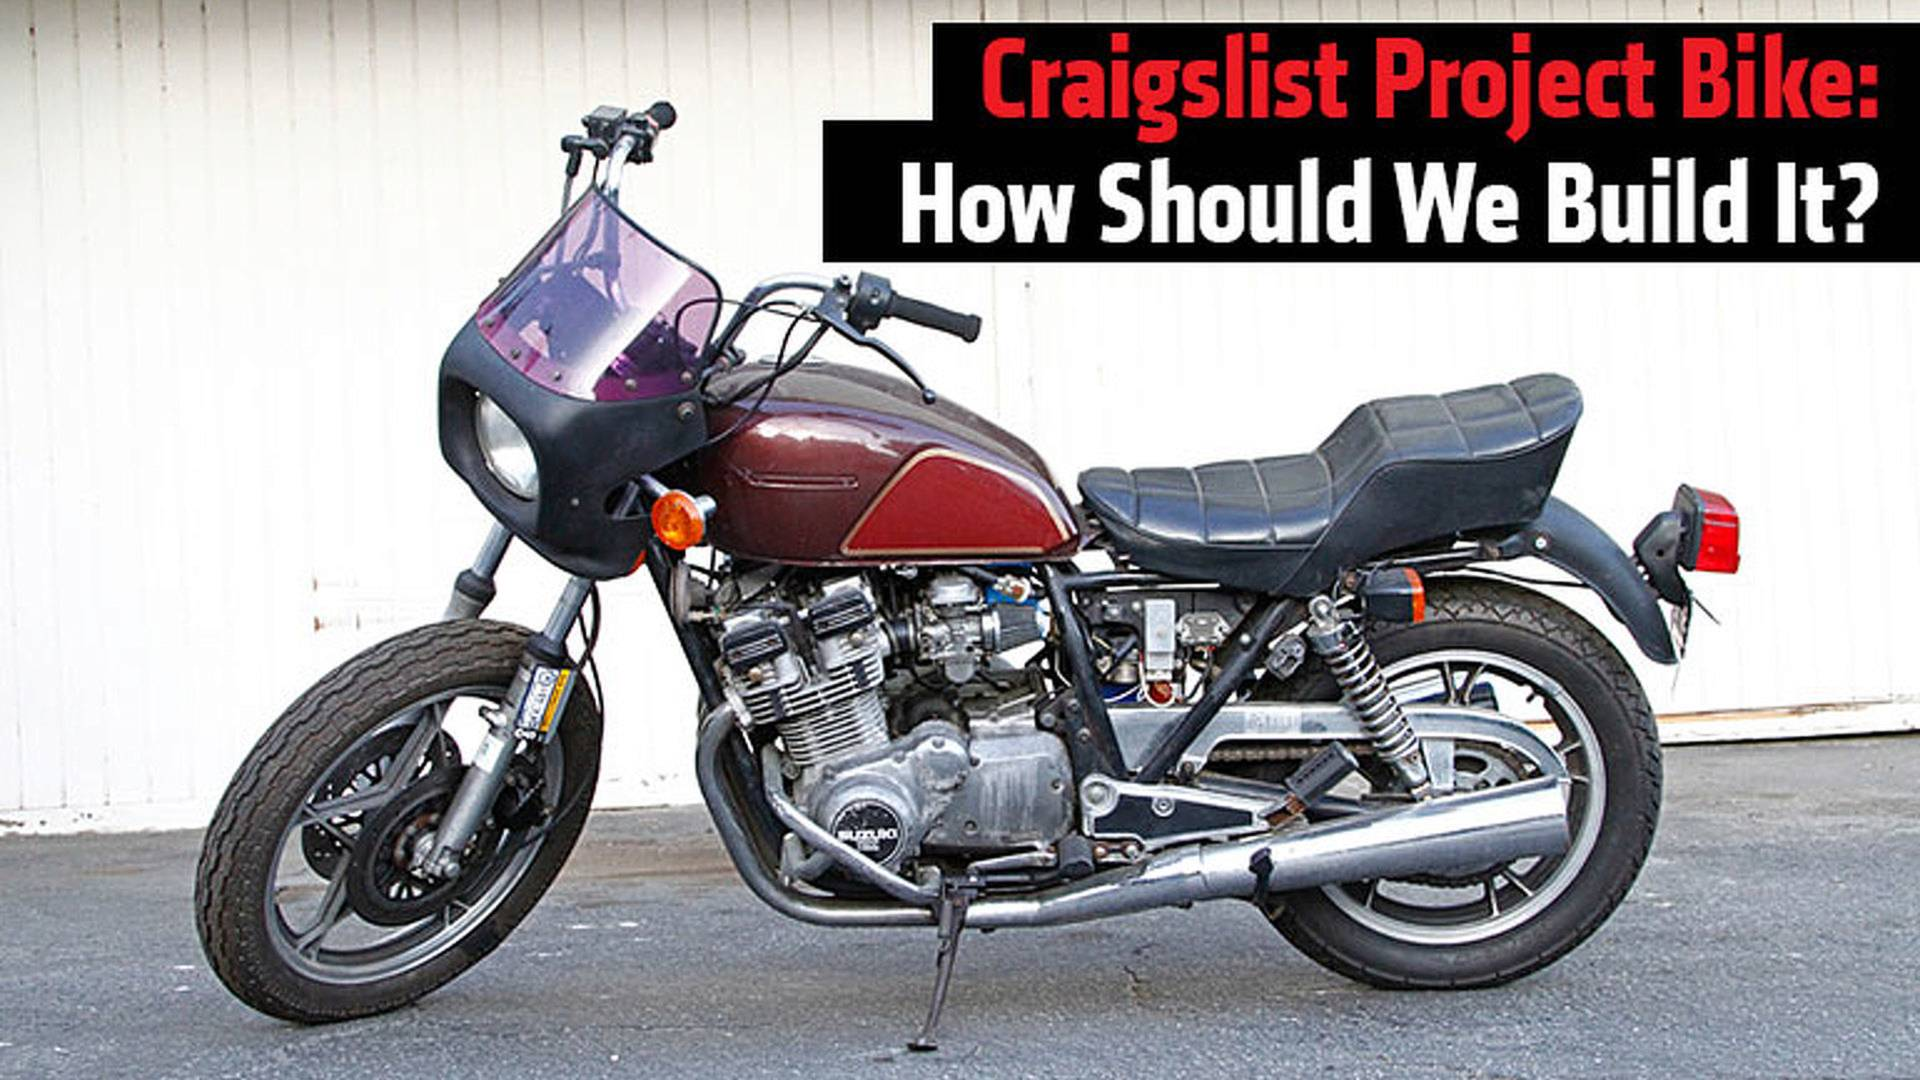 Craigslist Project Bike: How Should We Build It?